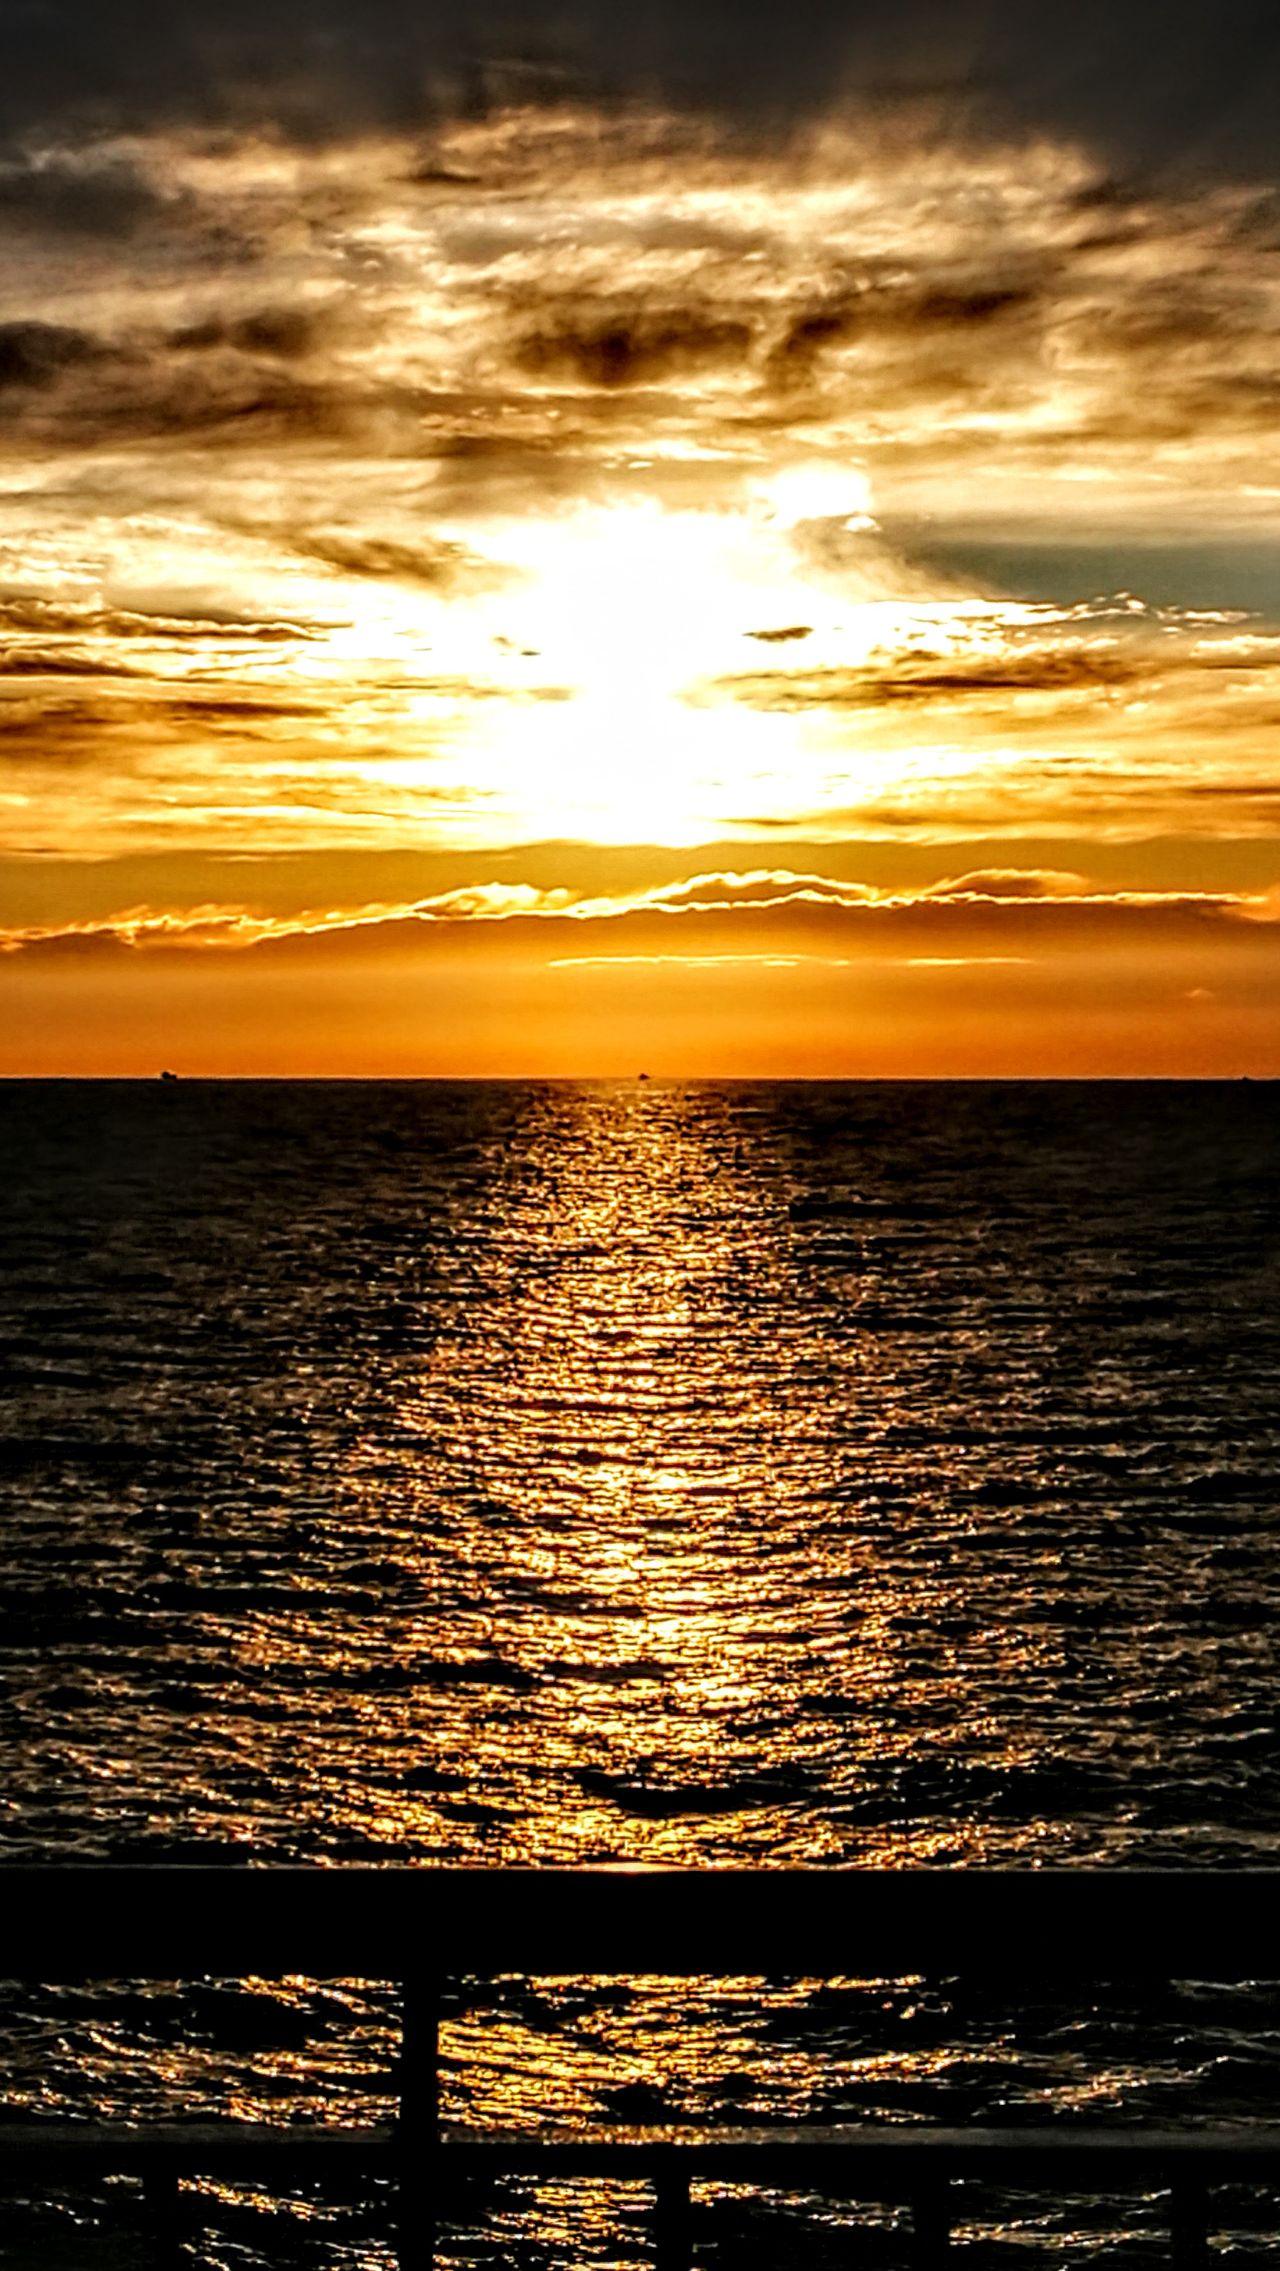 On the Sea Ferry to Barcelona...beautiful Sundown... Sunset Sea Seascape Scenics Tourism Tranquility Water Beauty In Nature Nature Romantic Sky Dramatic Sky Beach Outdoors Travel Destinations Horizon Over Water No People Sun Wave Sky Barcelona, Spain GetbetterwithAlex Nostalgic Scene Originalpicture